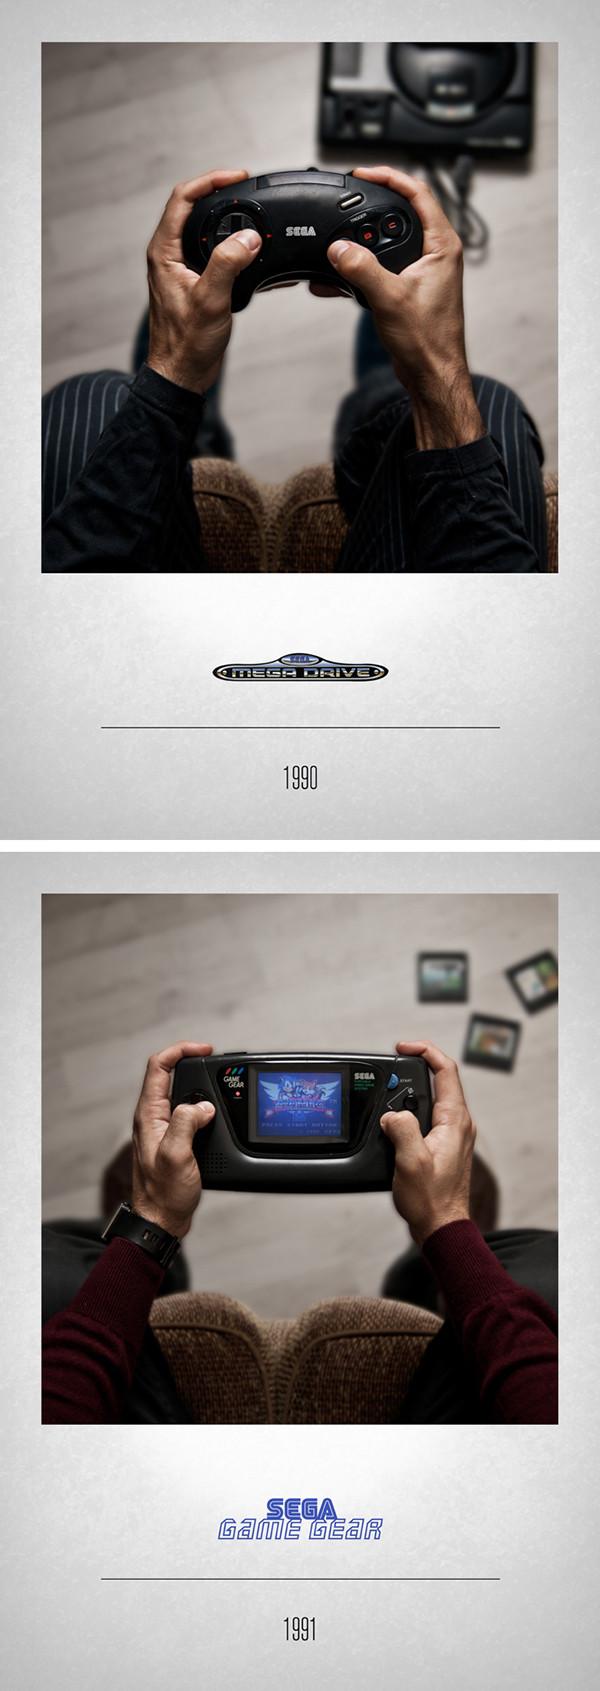 Sega Mega Drive 1990 – Sega Game Gear 1991